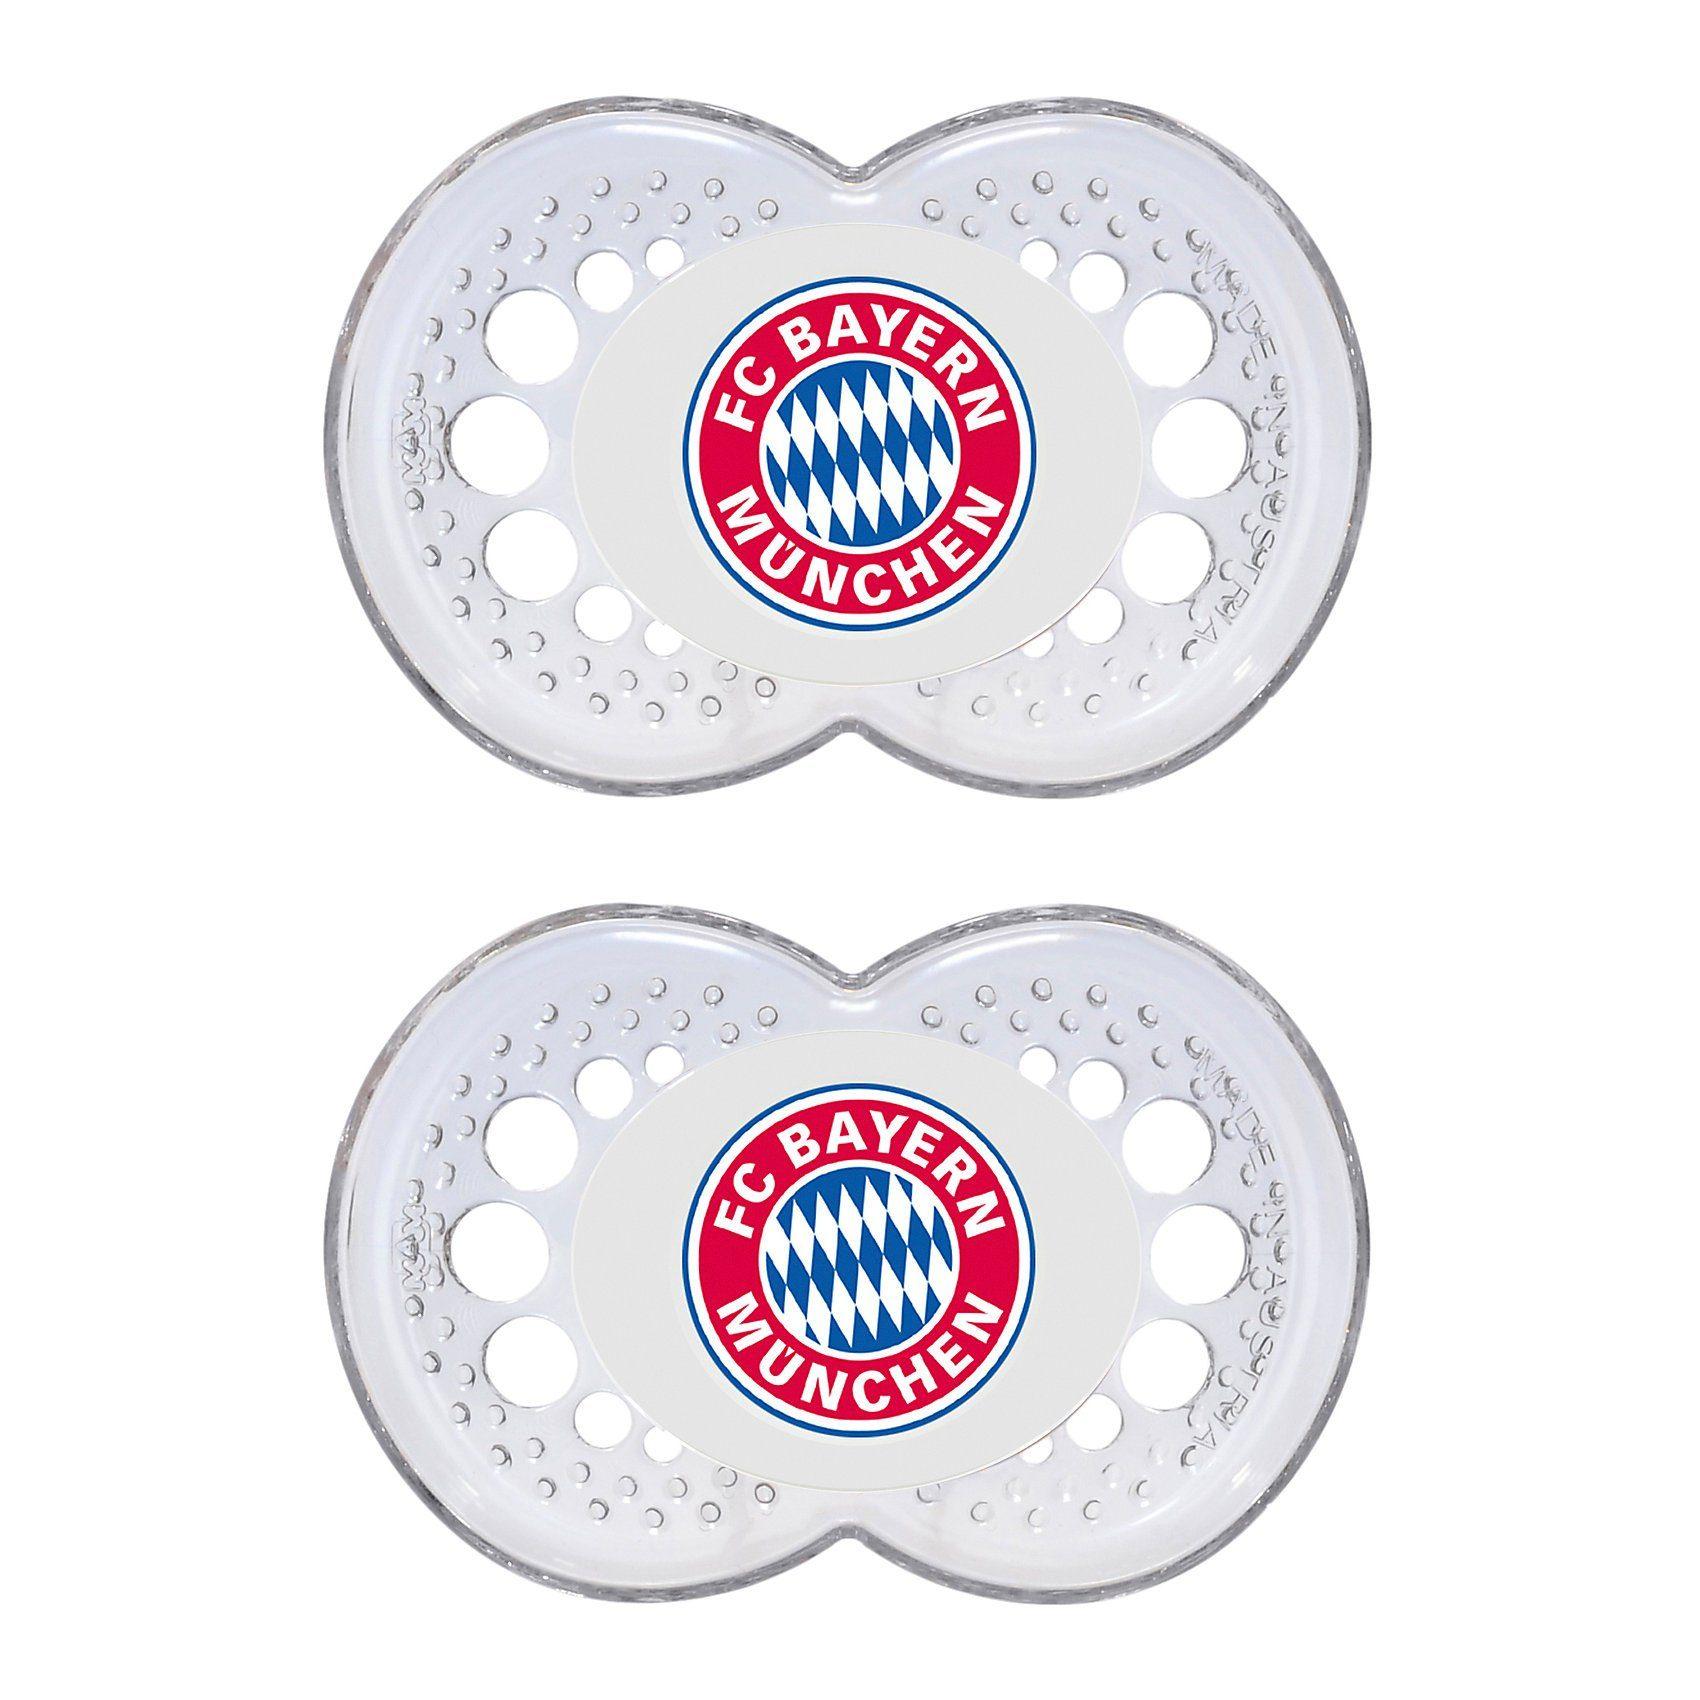 MAM Schnuller Fußball, Silikon, Gr. 2, FC Bayern München